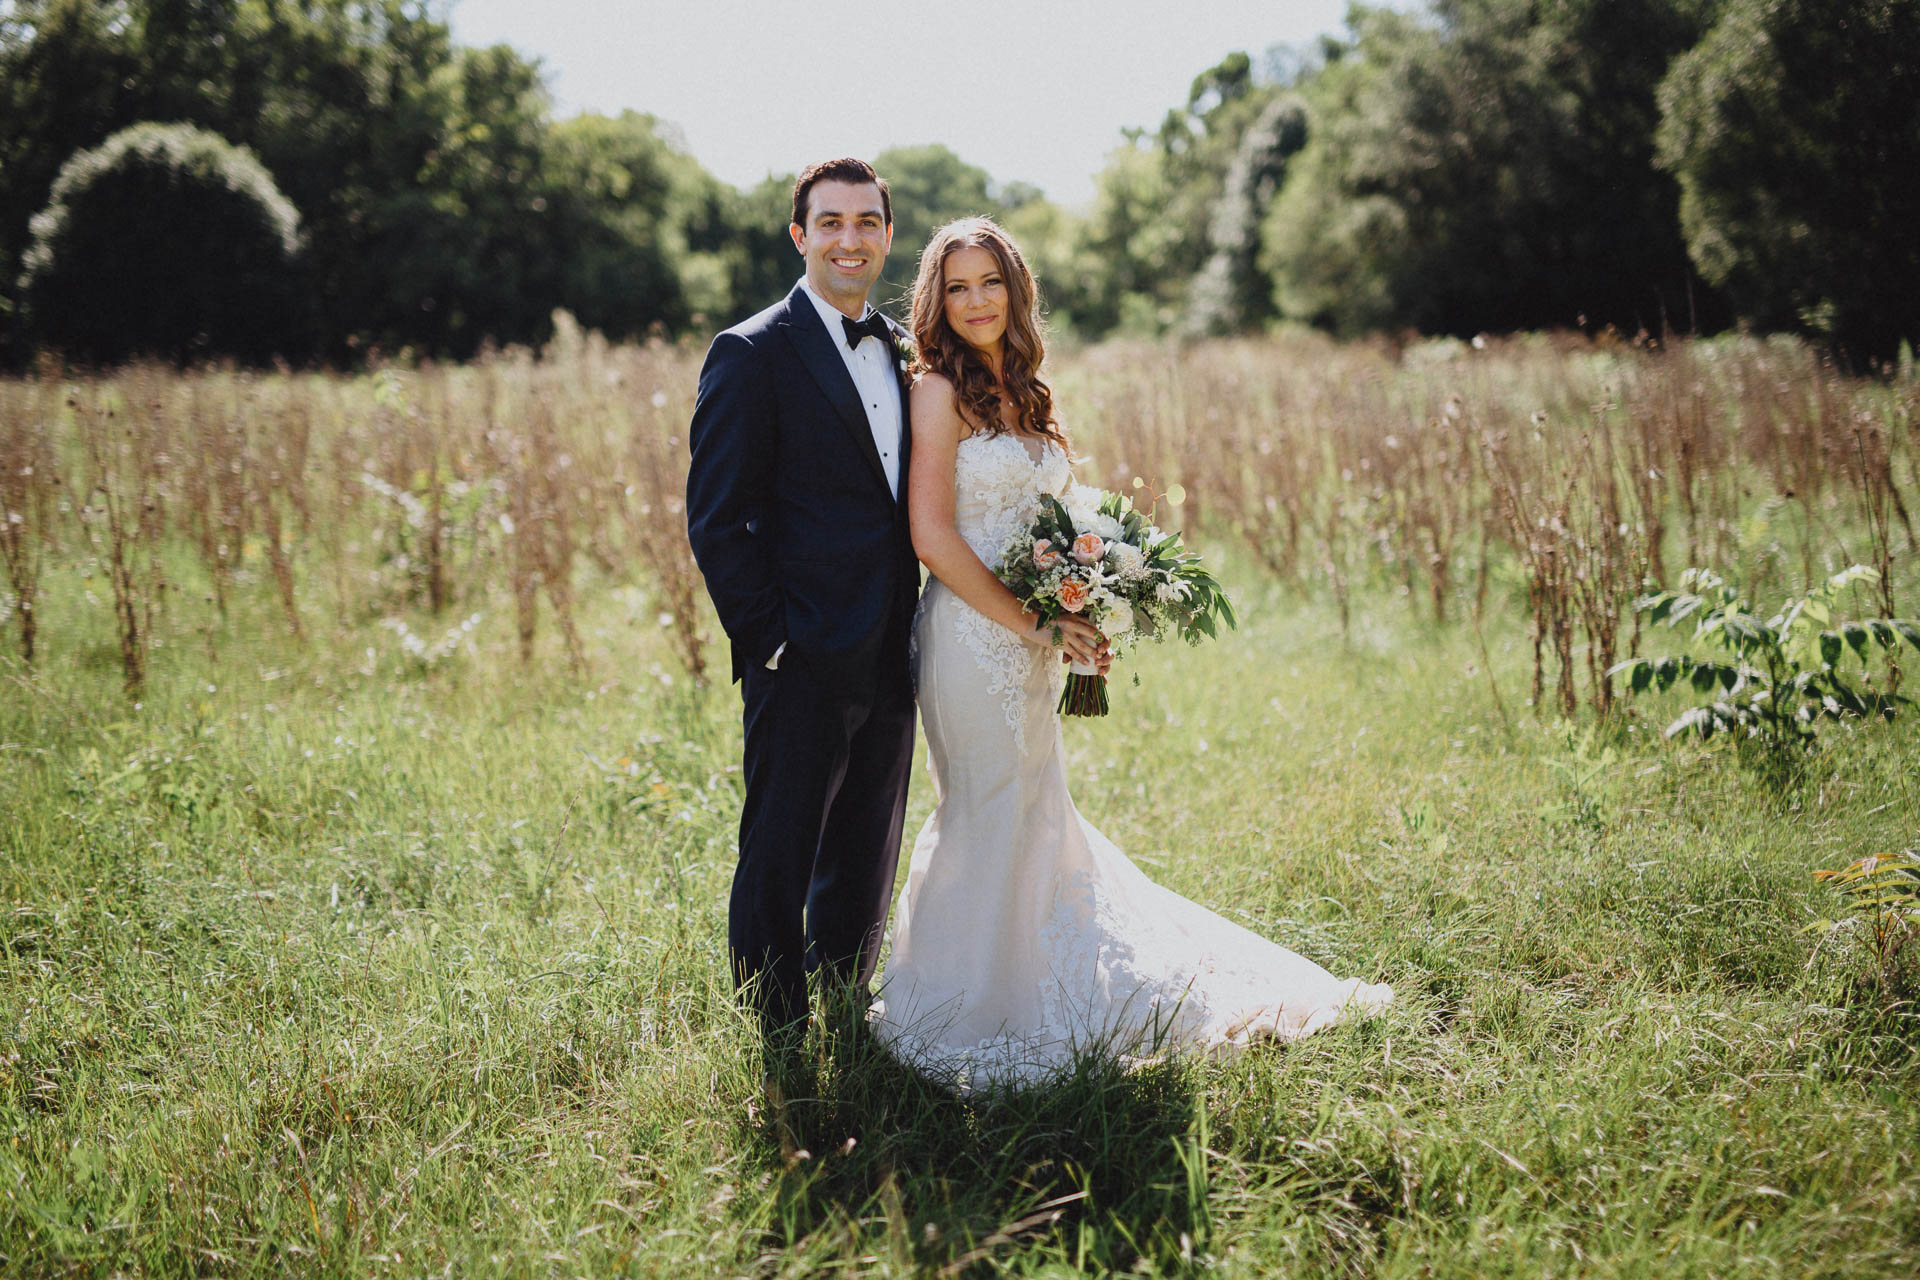 Keri-Joseph-Top-of-the-Market-Wedding-126@2x.jpg